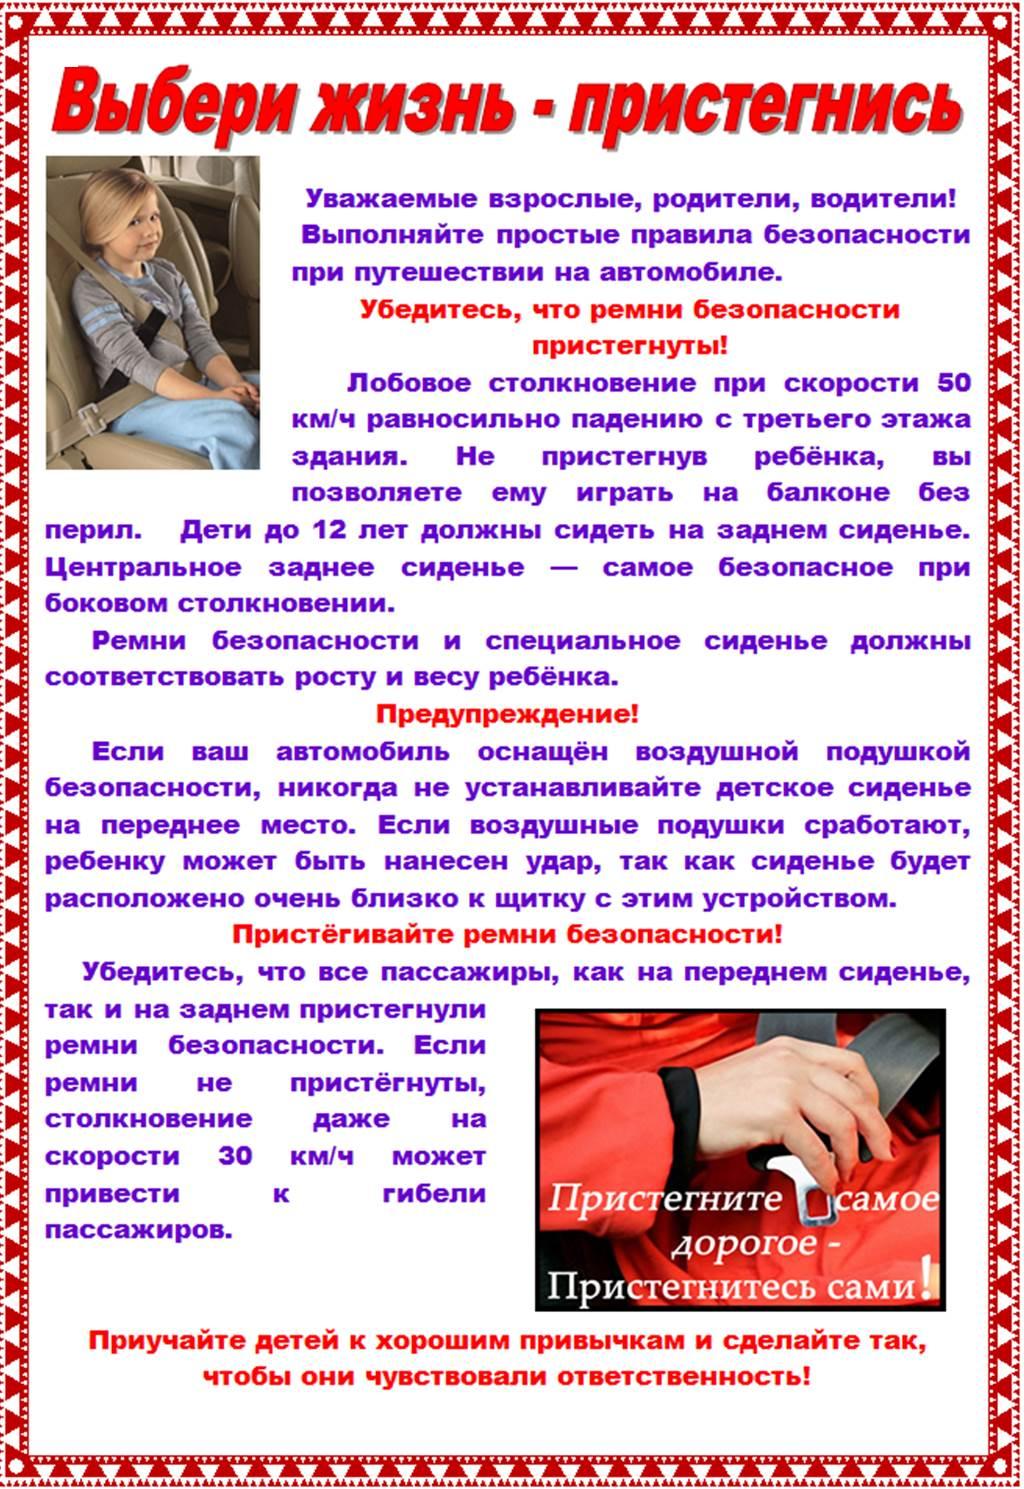 pamjatka_vyberi_zhizn-pristegnis